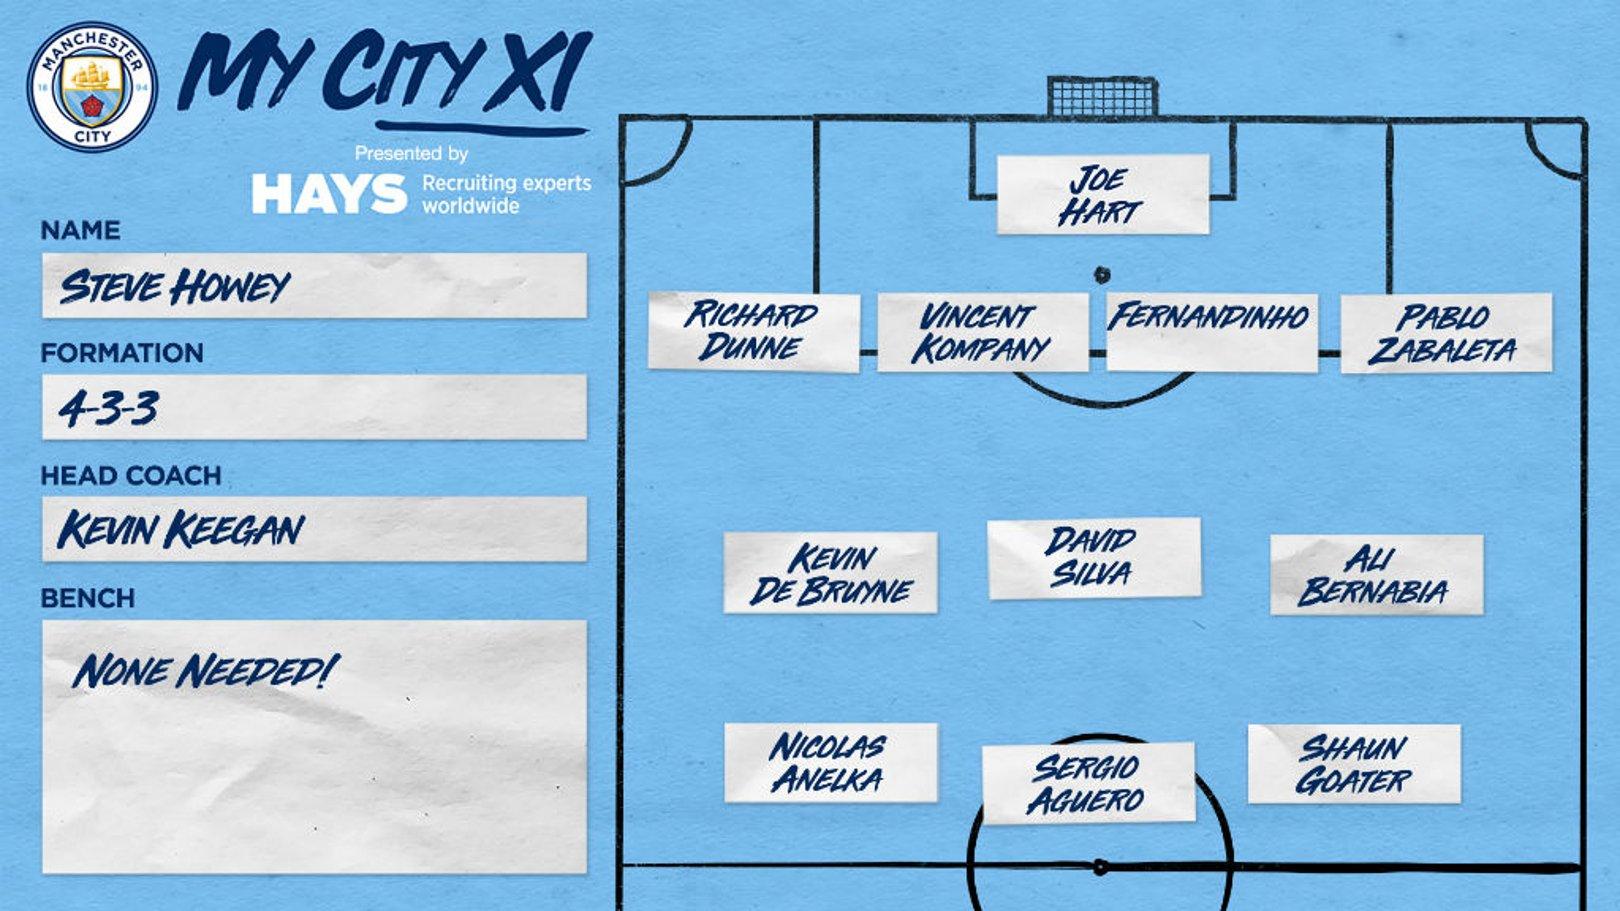 My City XI: Steve Howey